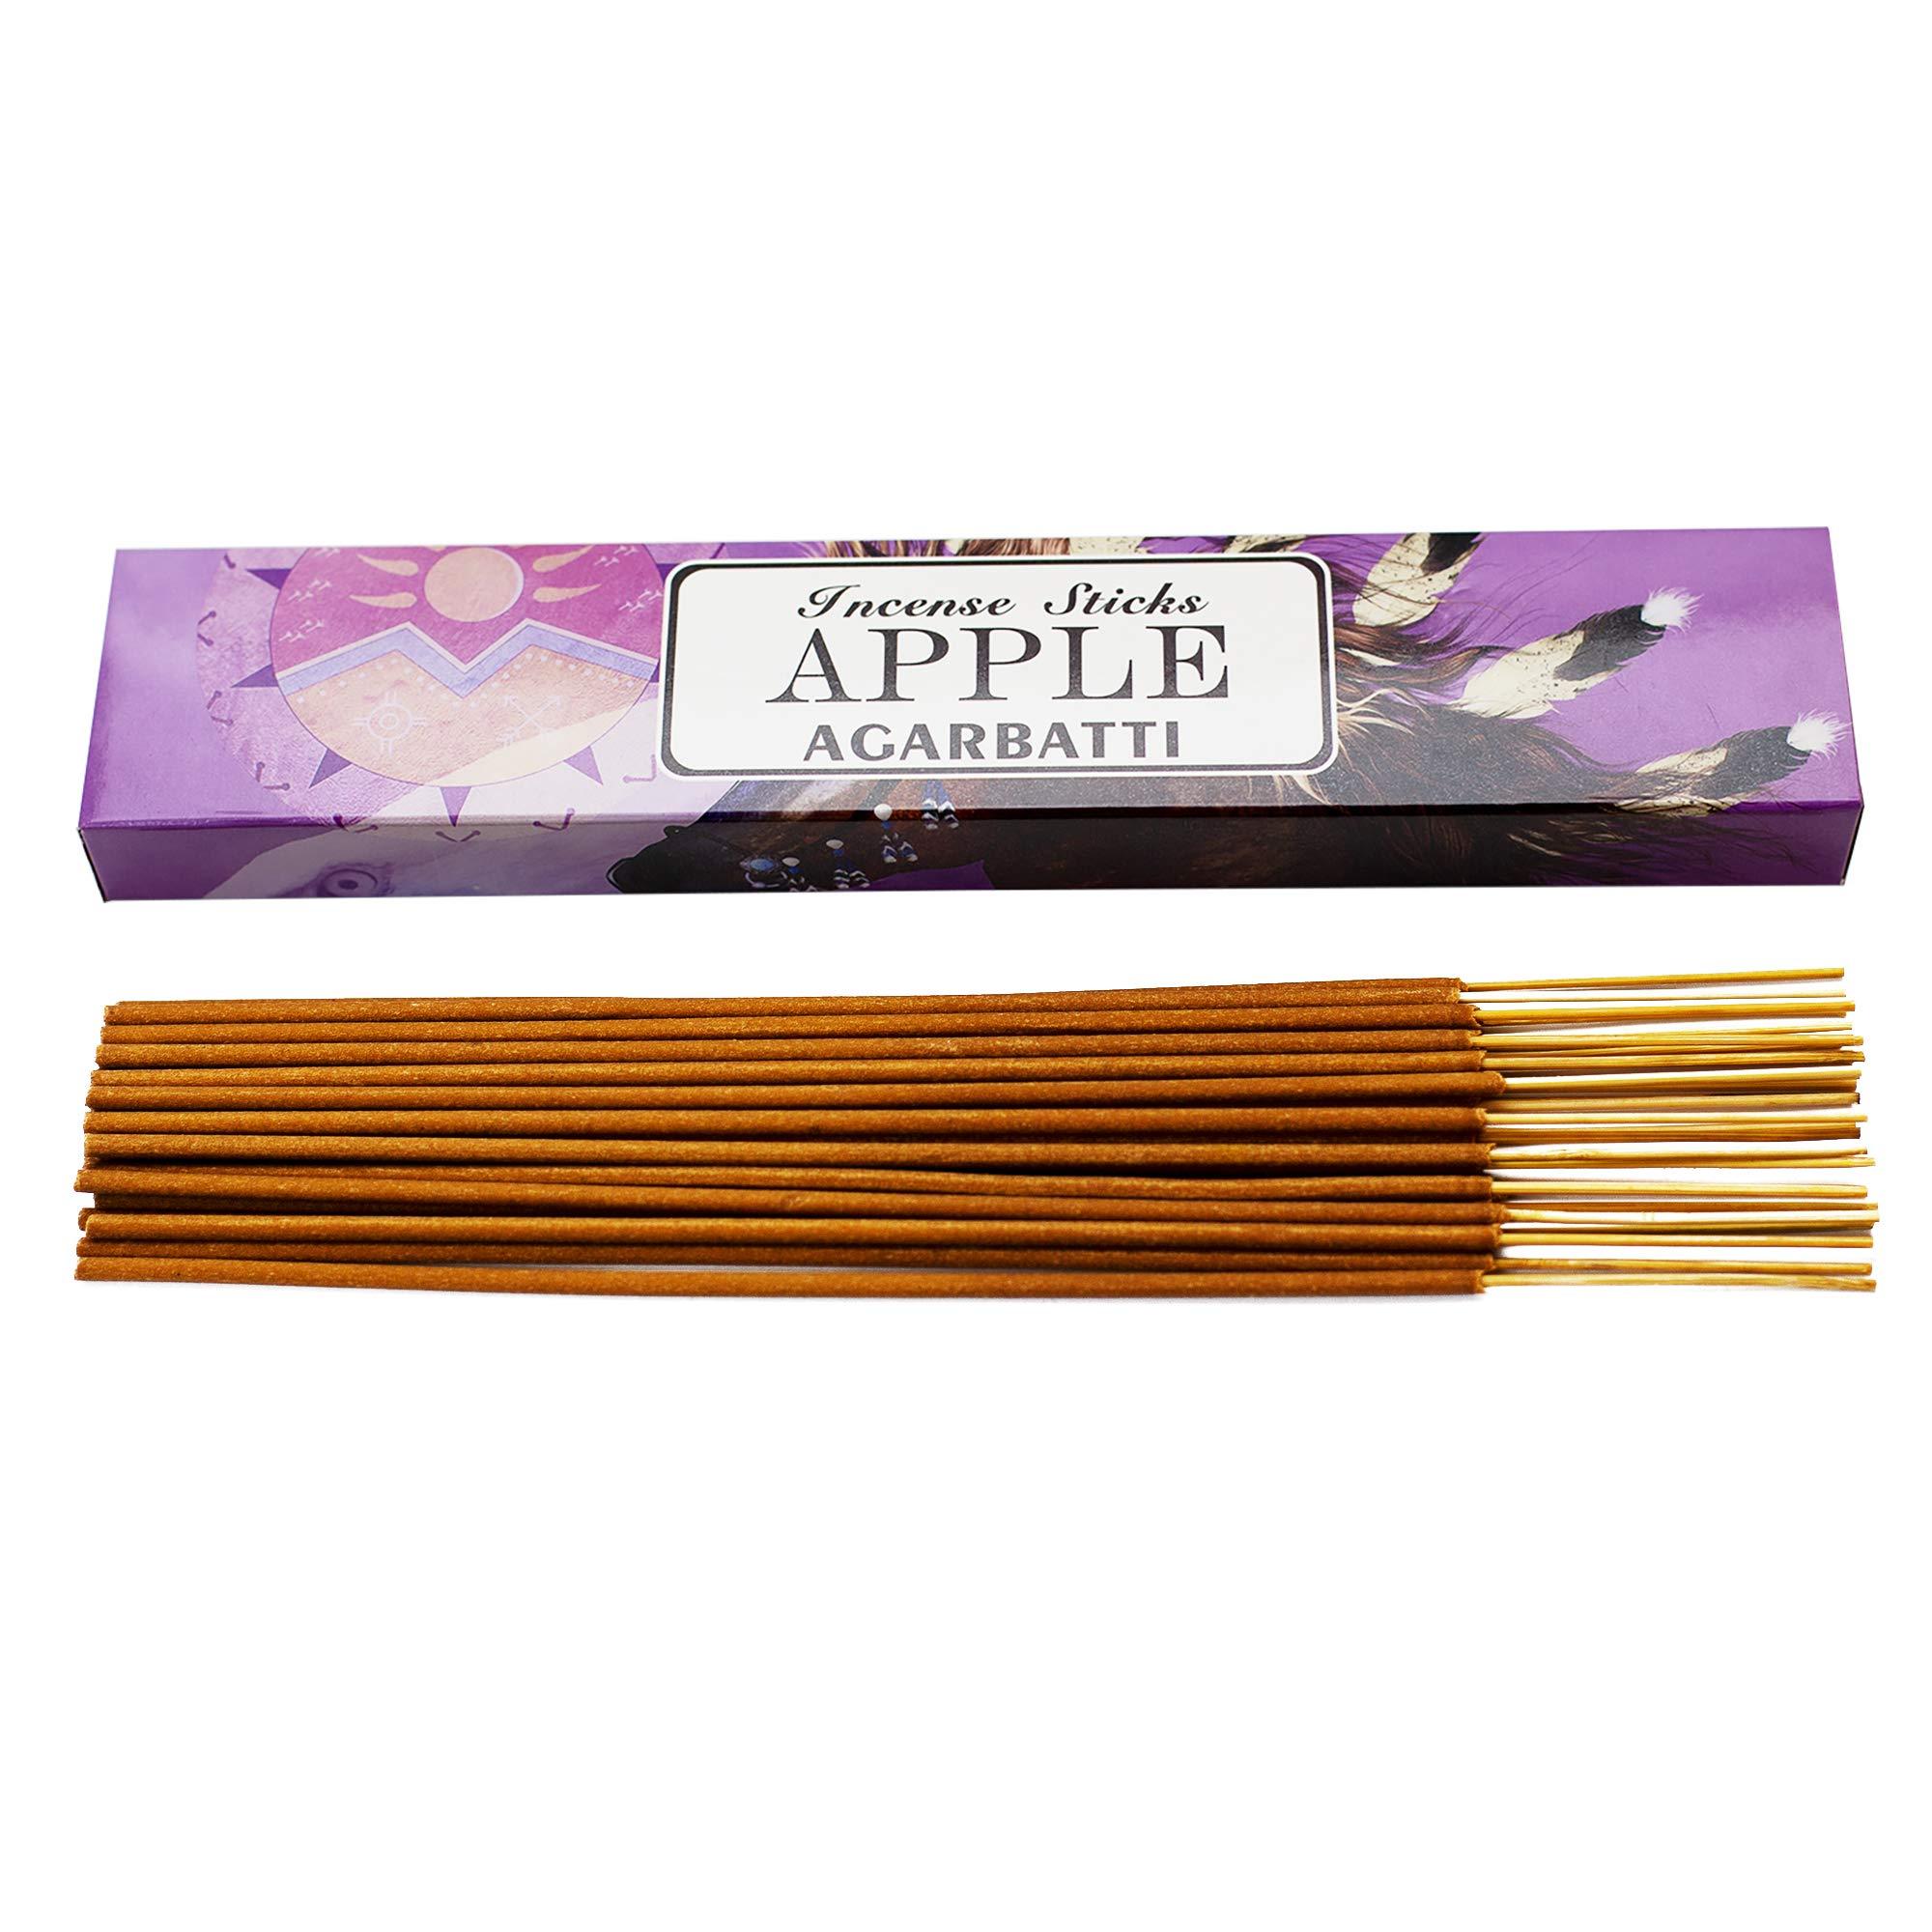 Mosfantal Premium Hand Dipped Incense Sticks - Lemon, Jasmine, Lavender, Vanilla, Apple, Variety Gift Pack (240Gram) by Mosfantal (Image #2)